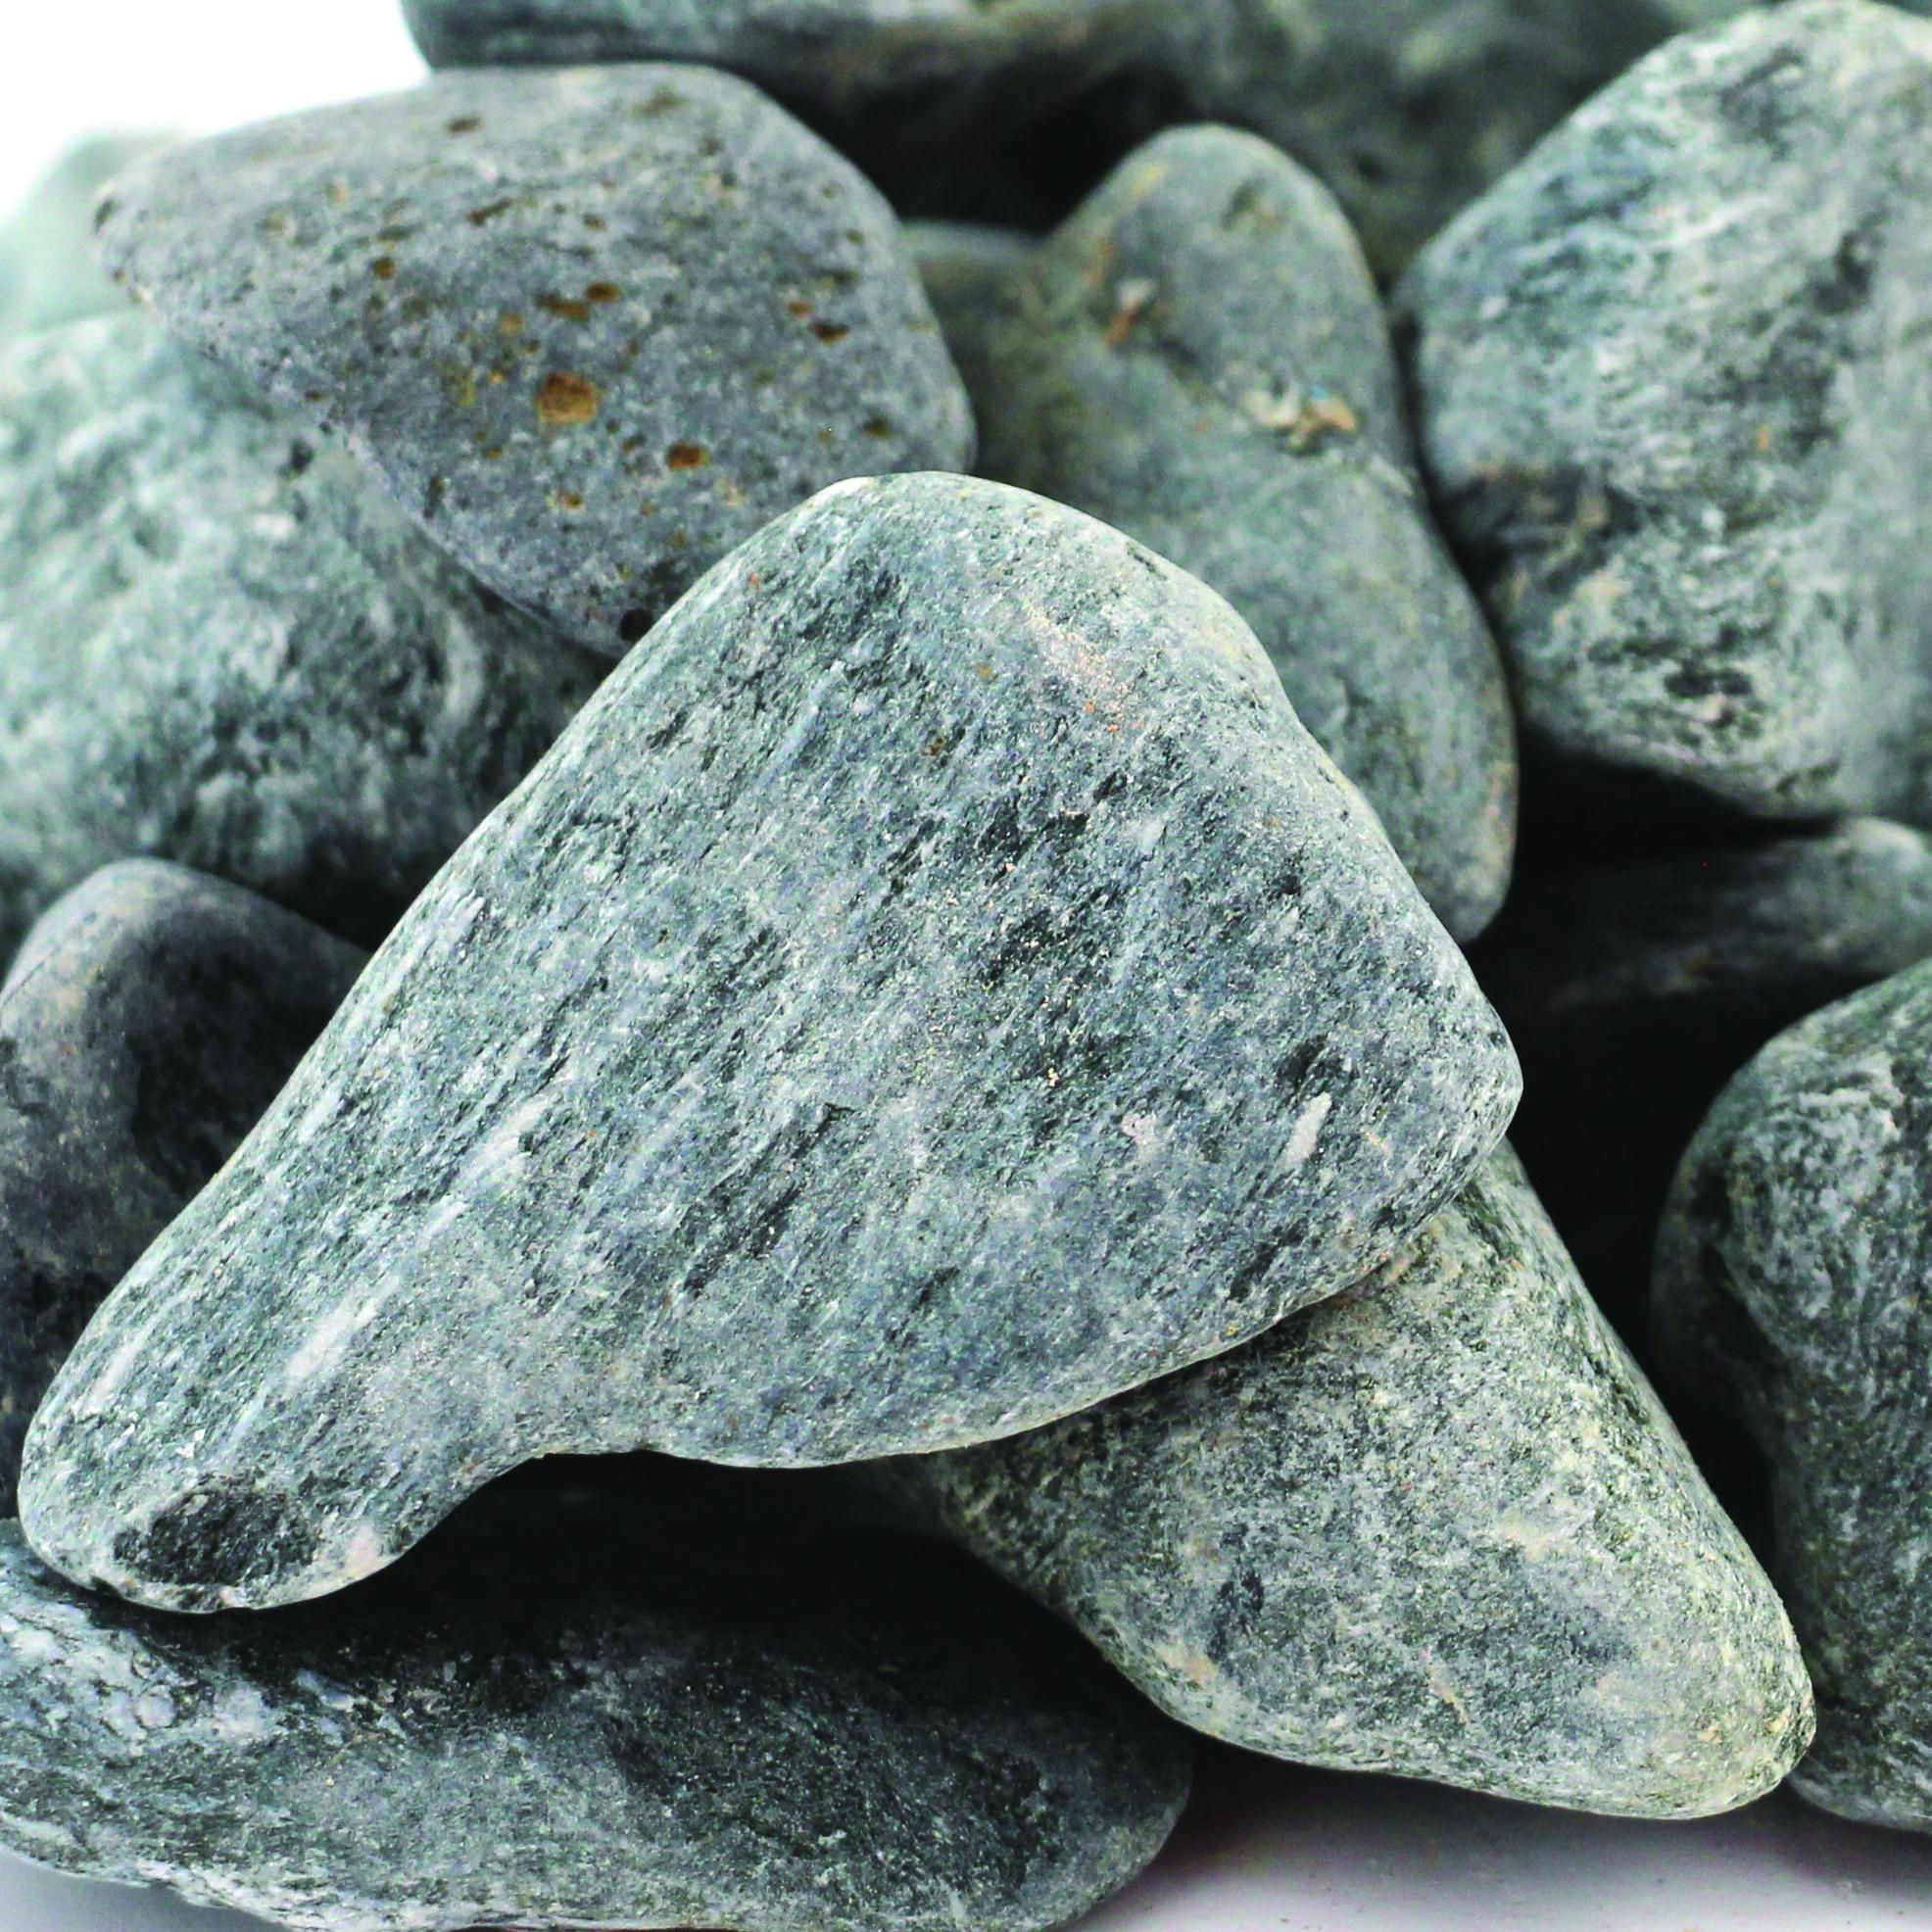 Galets vert galets d coratifs silaco natural stones for Galets plats decoratifs